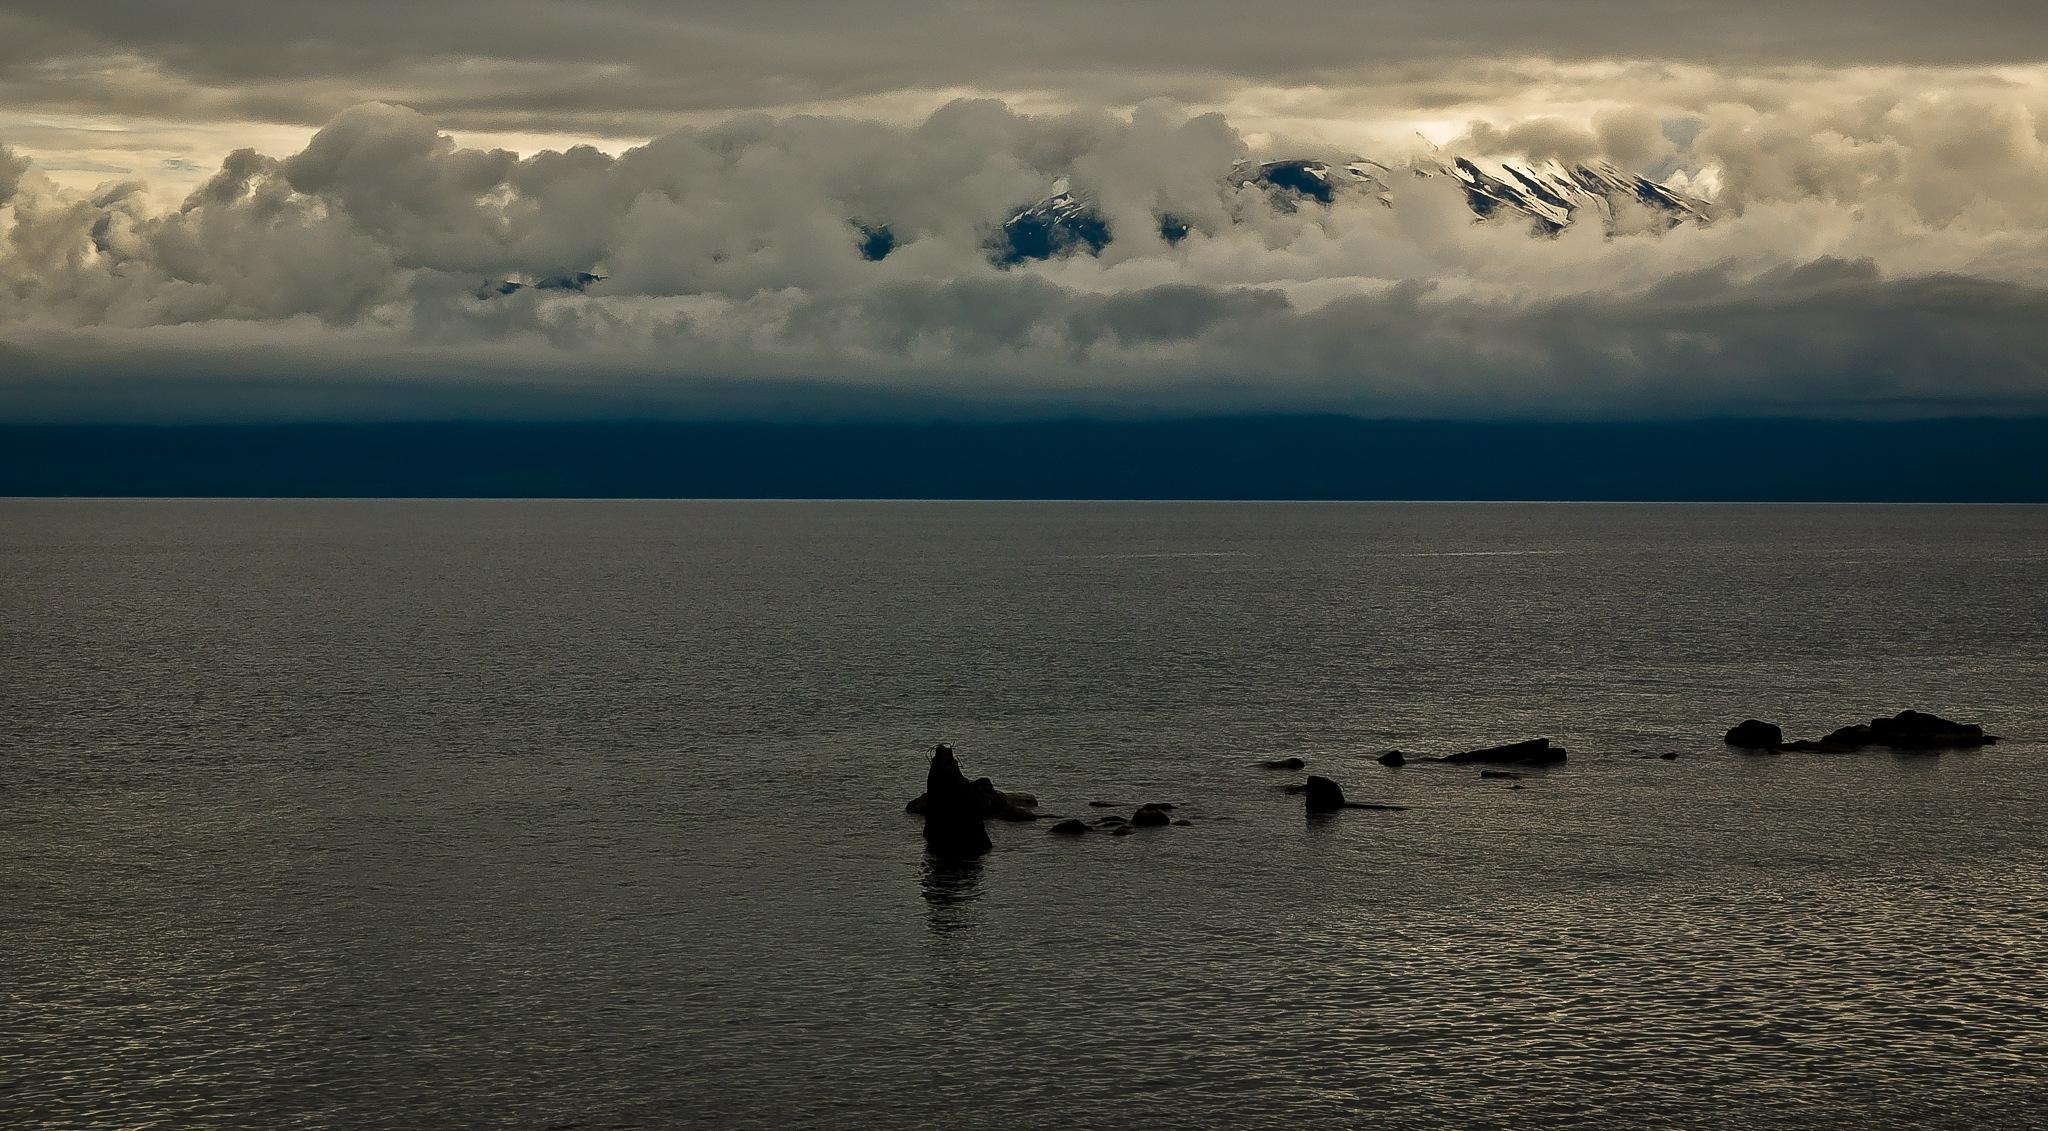 Nubes del amanecer by oscarruben_suarez